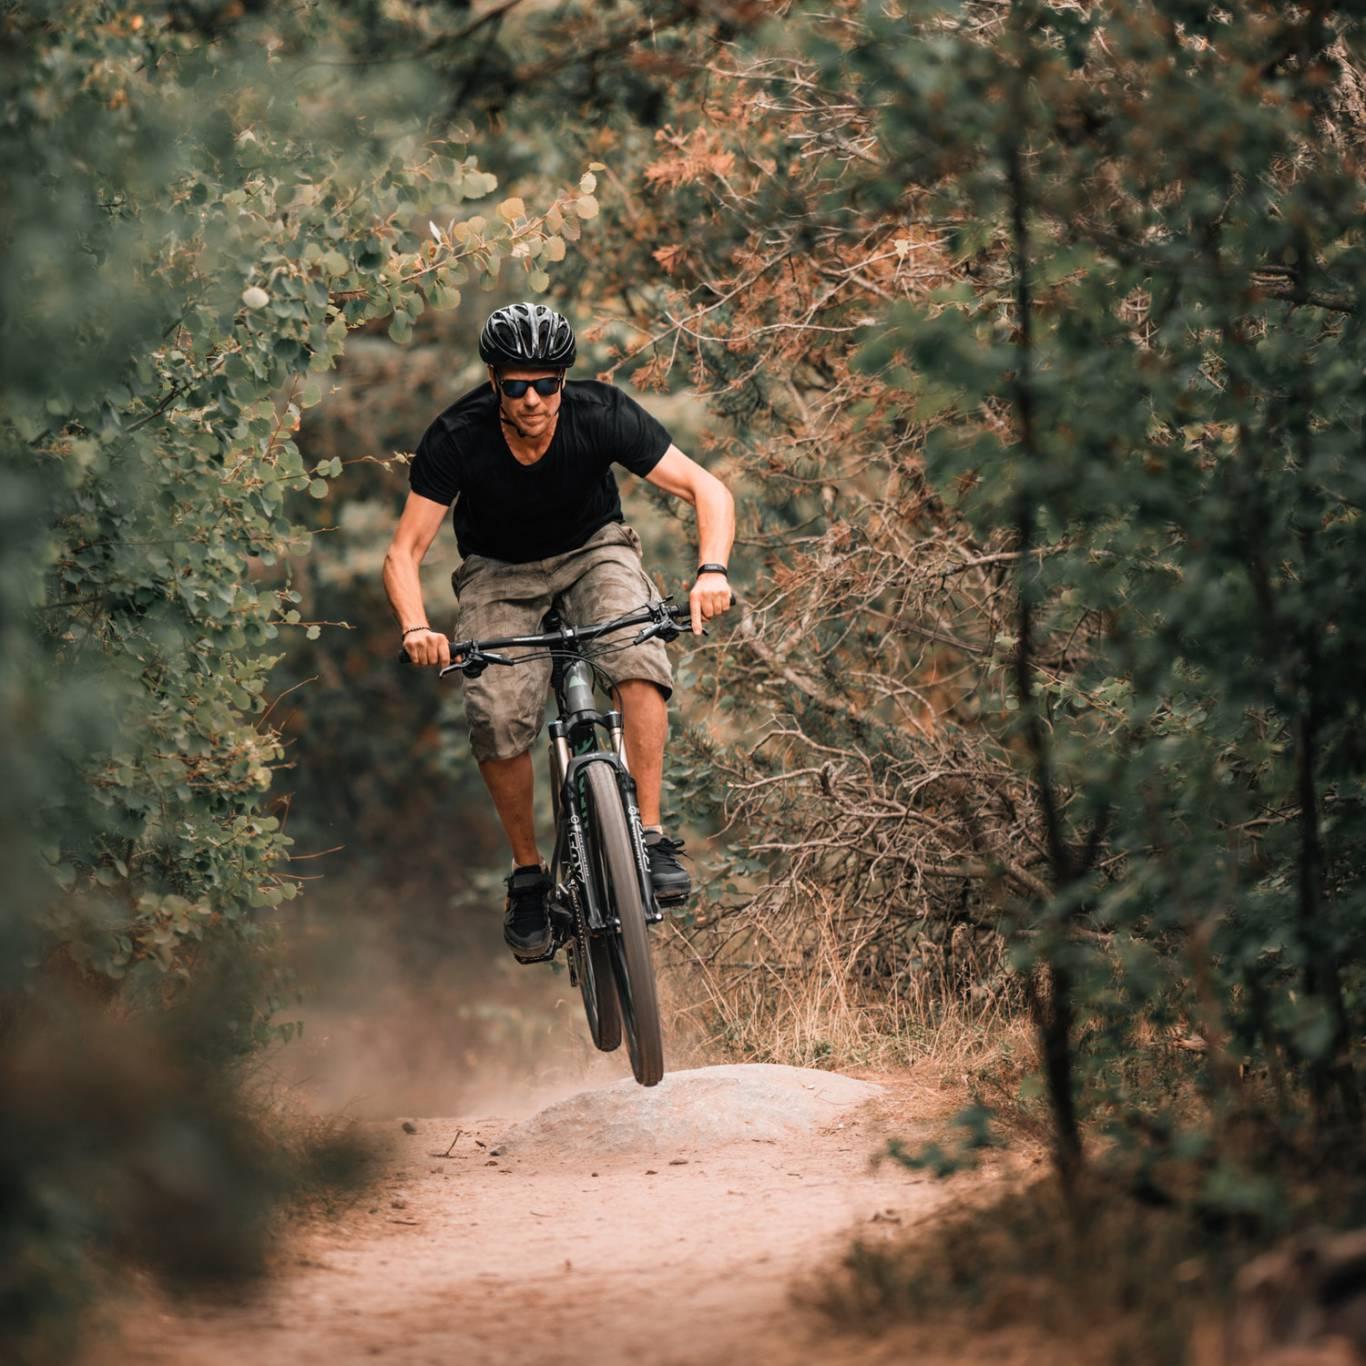 relais-borgo-torale-tuoro-sul-trasimeno-wedding-location-mountain-bike-3